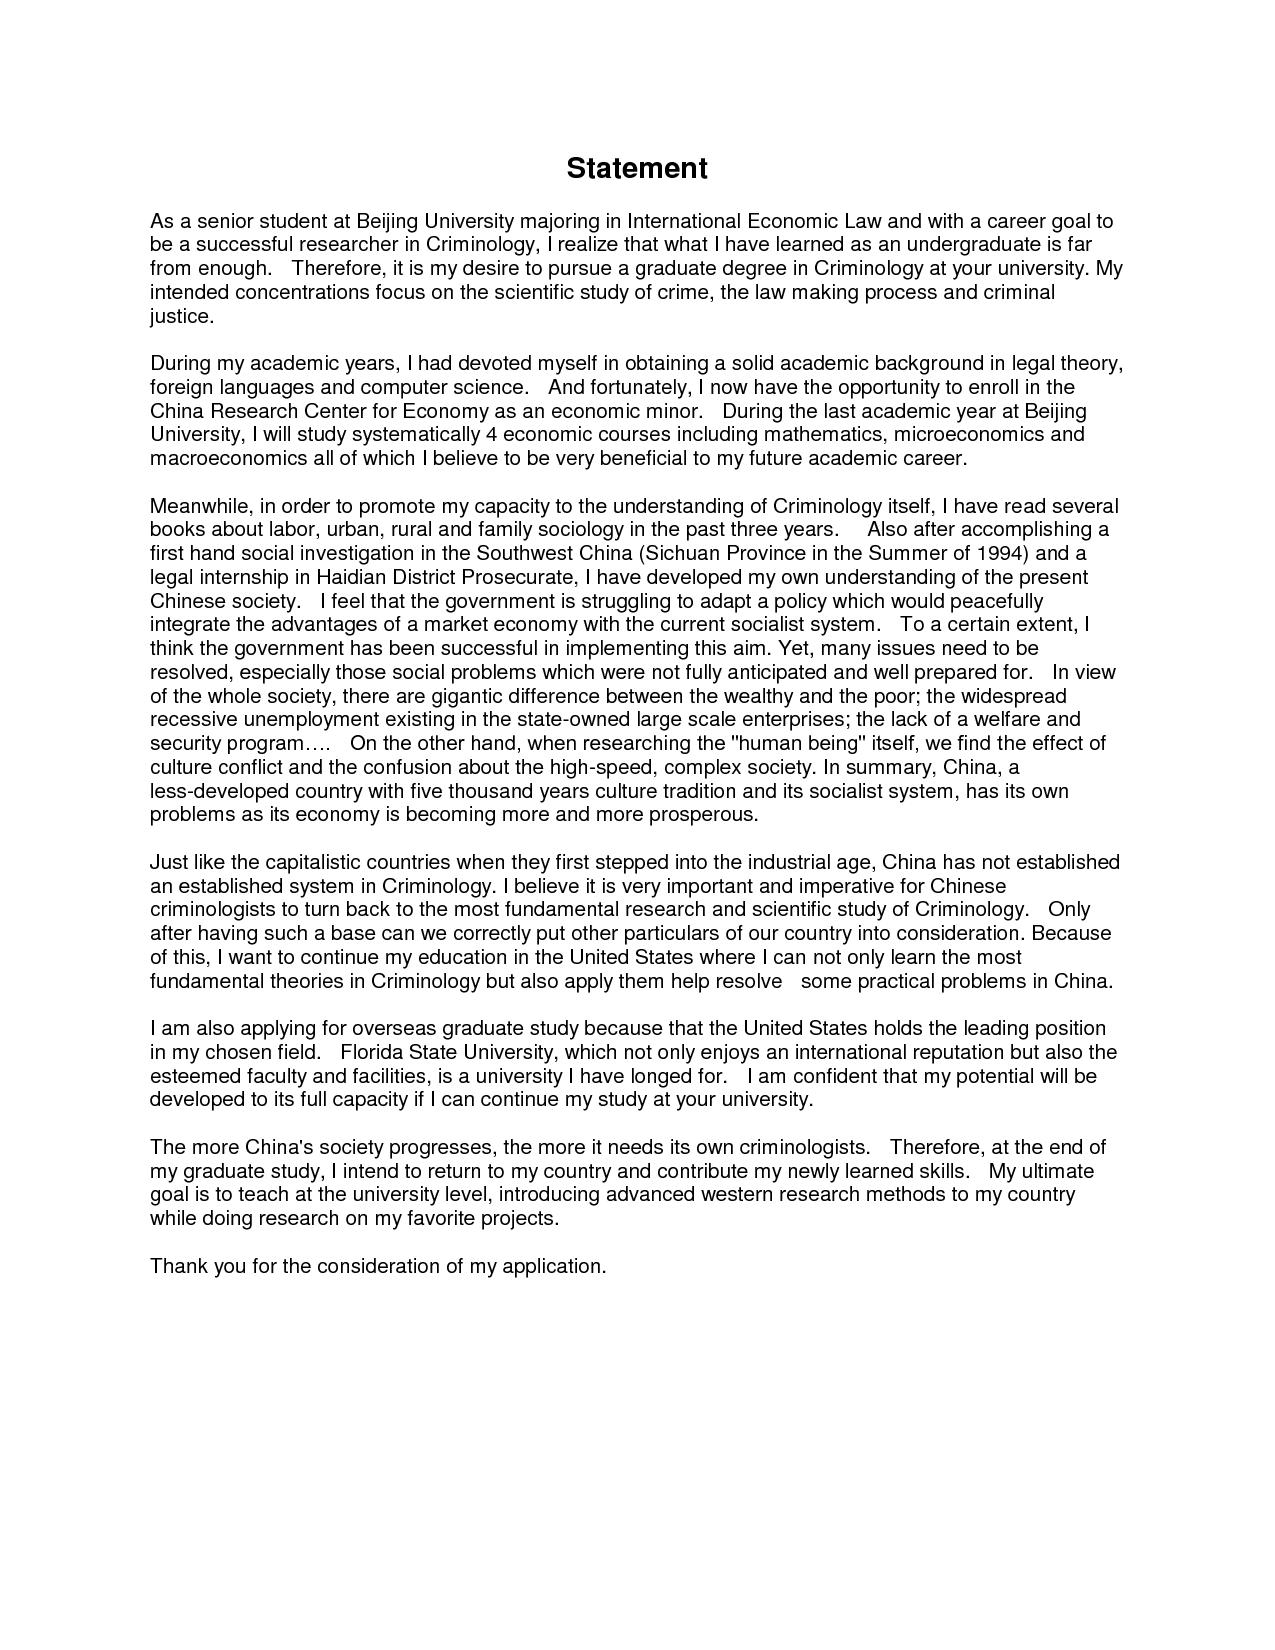 012 2444263891 What Is An Academic Essay Pdf Unbelievable Gujarati Free Download Argumentative Terrorism Full